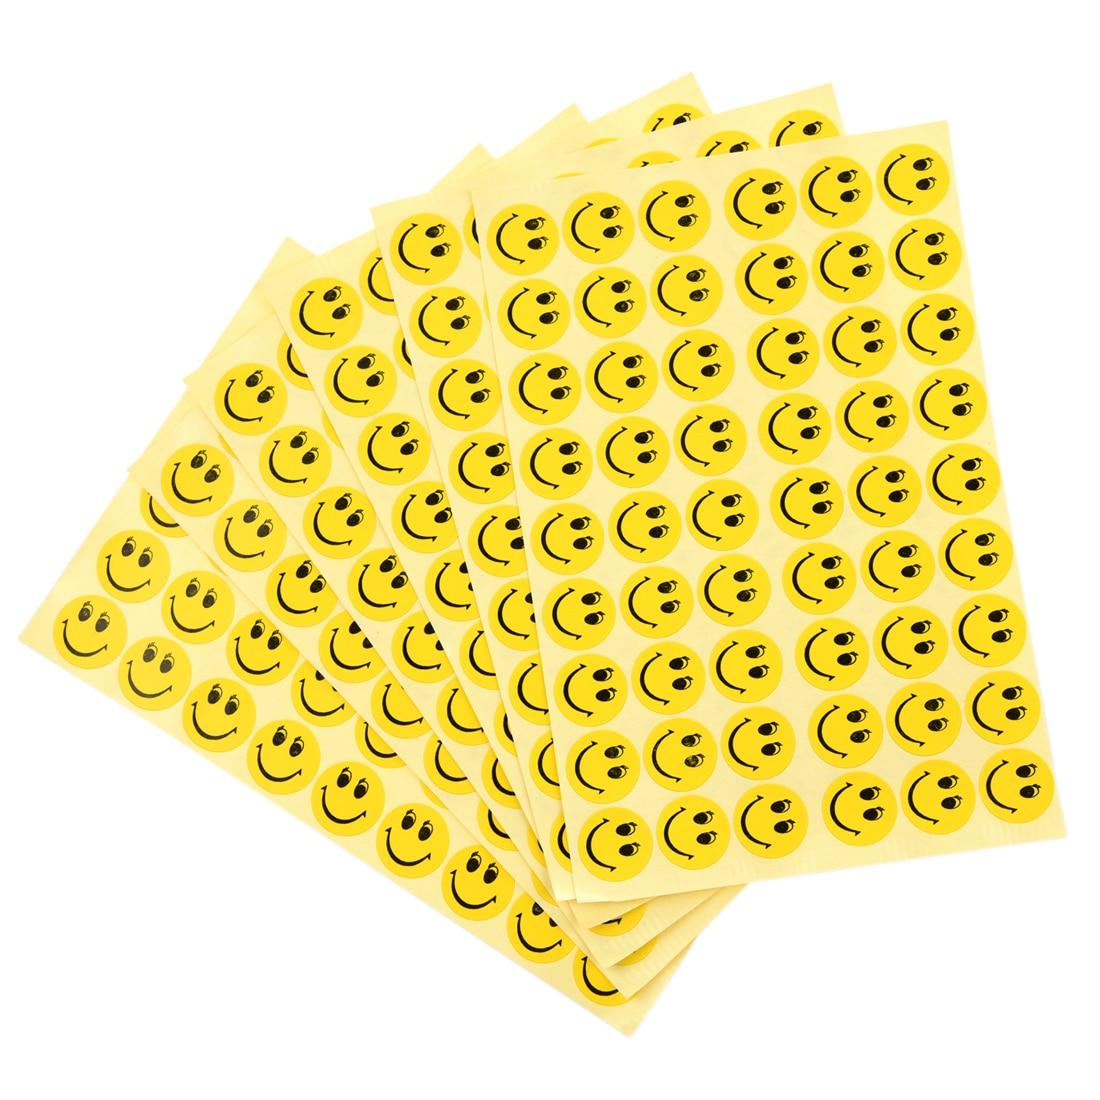 324 Pcs Smiley Face Children Reward Merit Praise Stickers For School Teacher Party